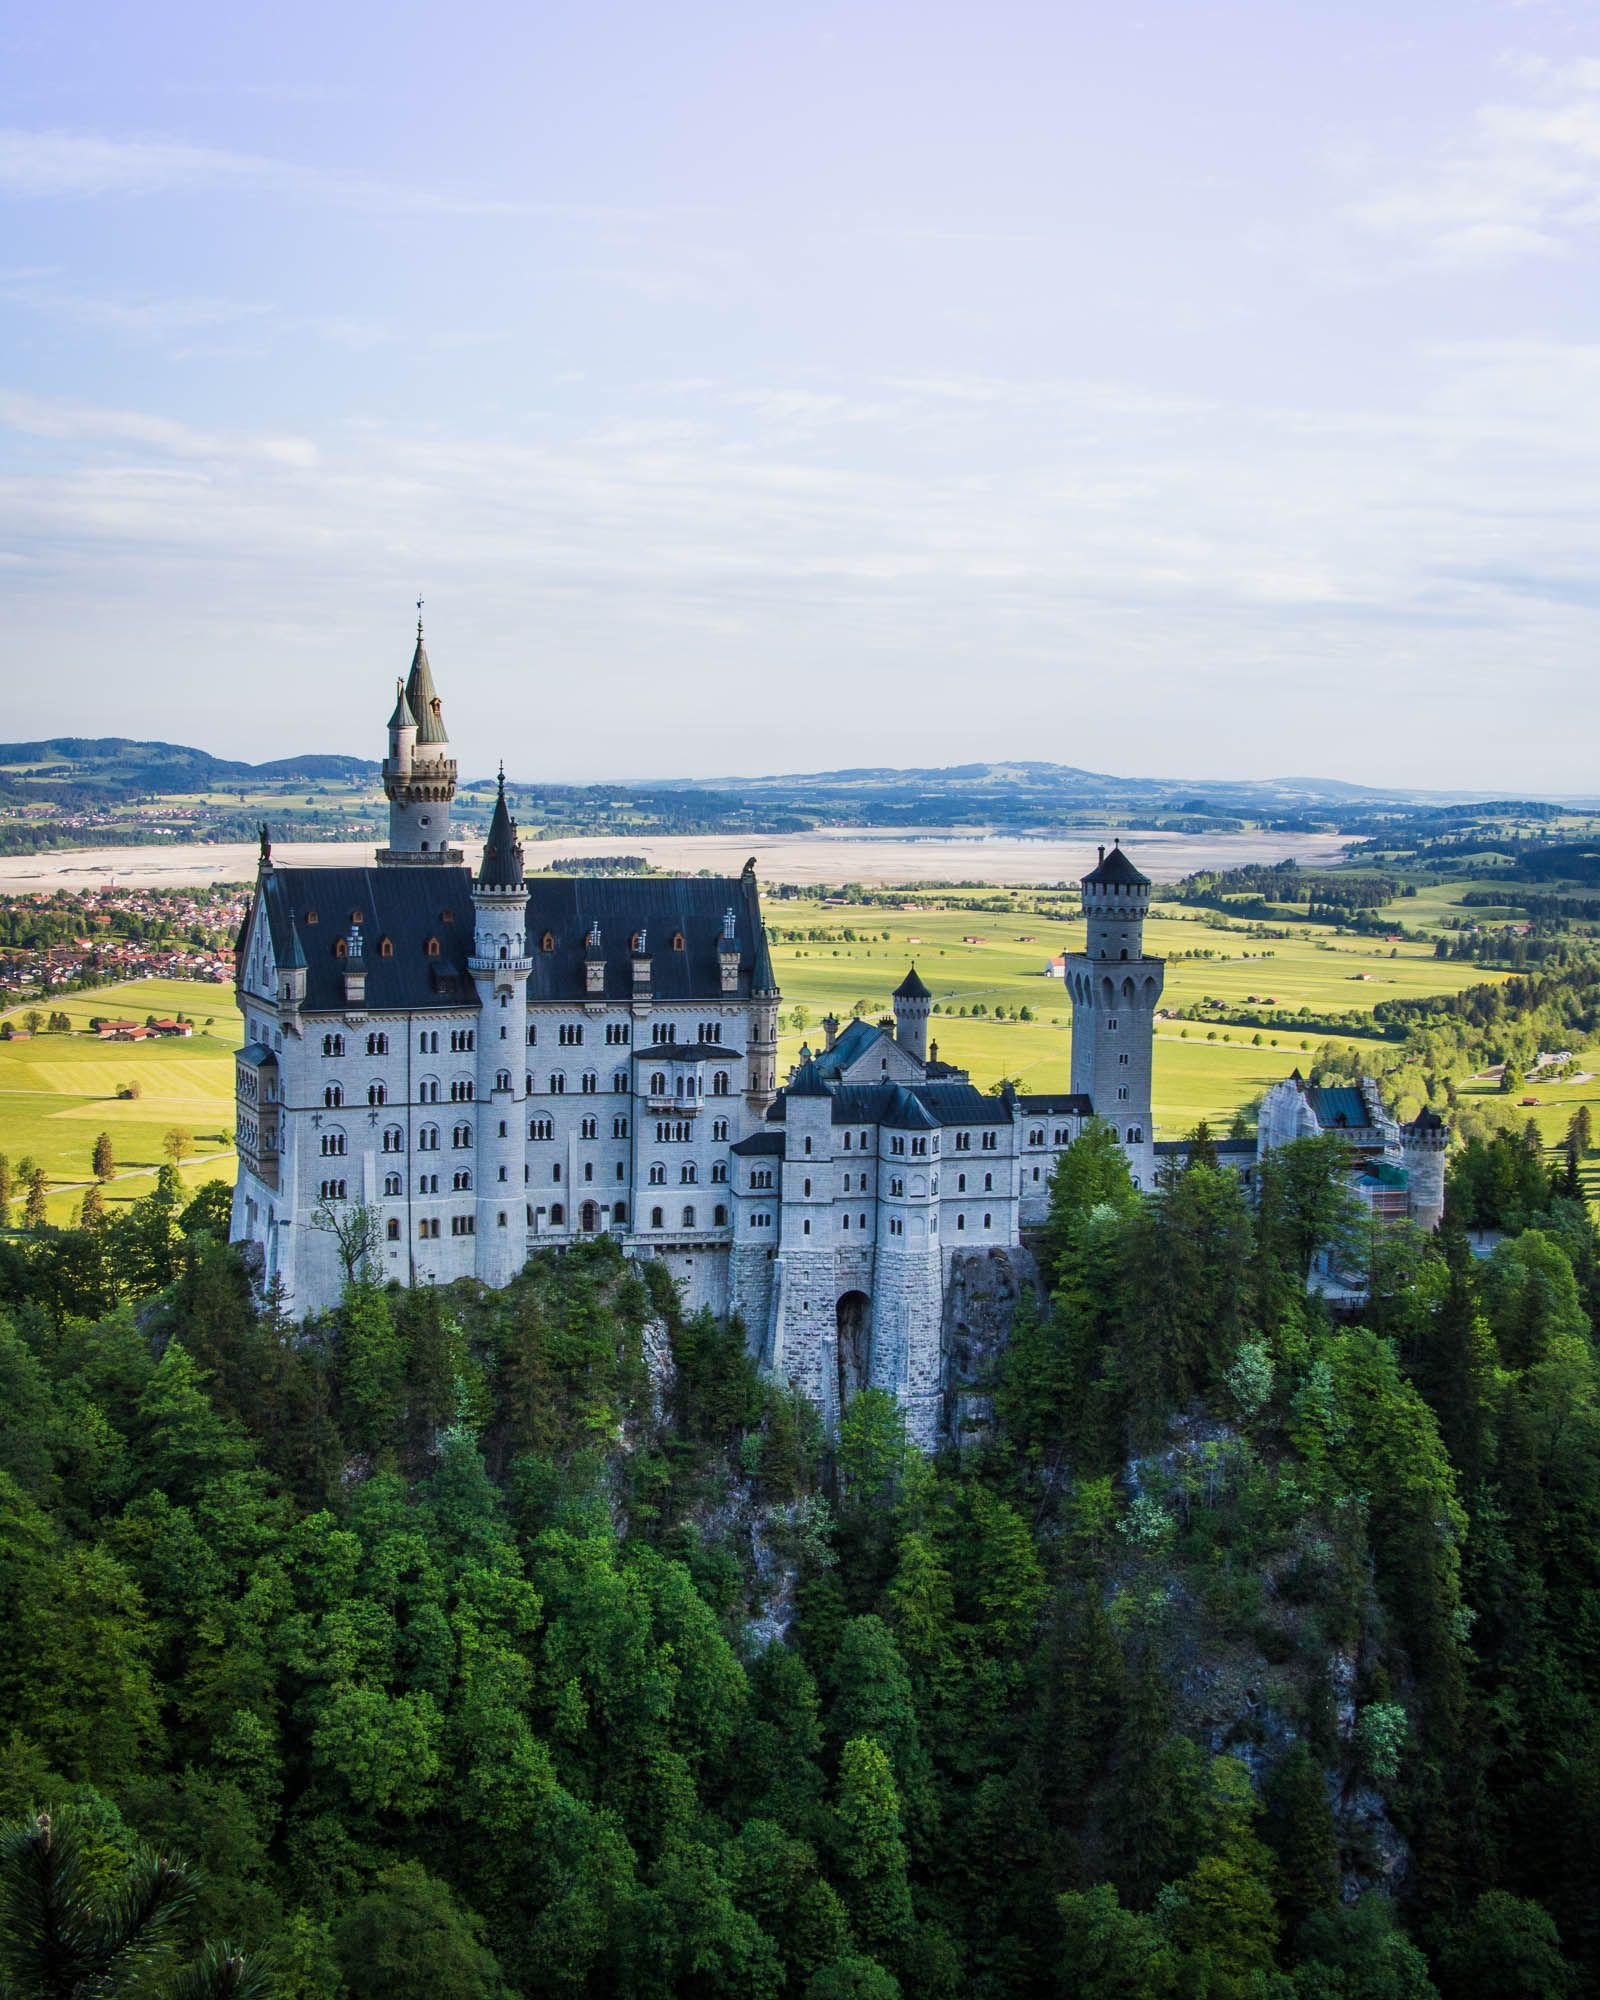 Allgau Fotospots Schloss Neuschwanstein Hohenschwangau Und St Coloman Schloss Neuschwanstein Tourismus Ausflugsziele